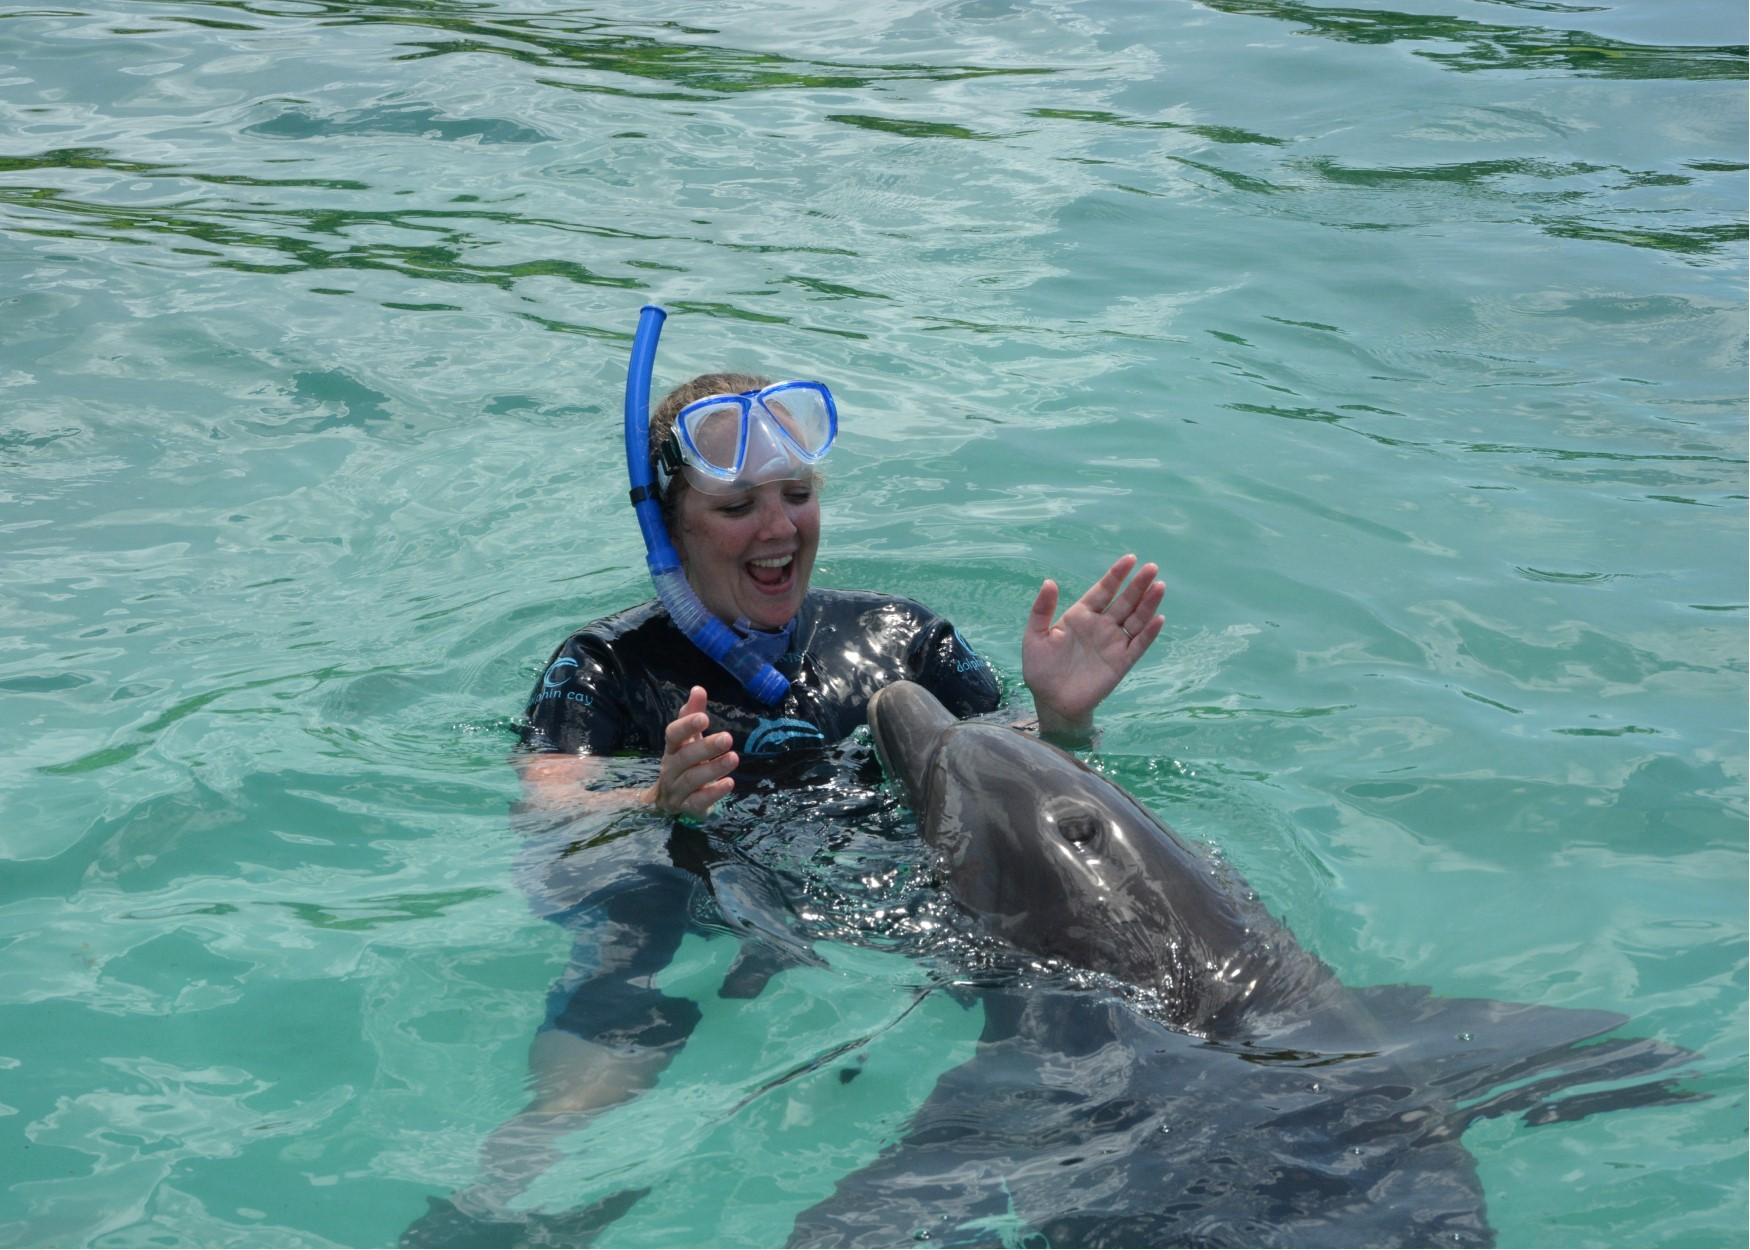 hill dolphin smile.jpg